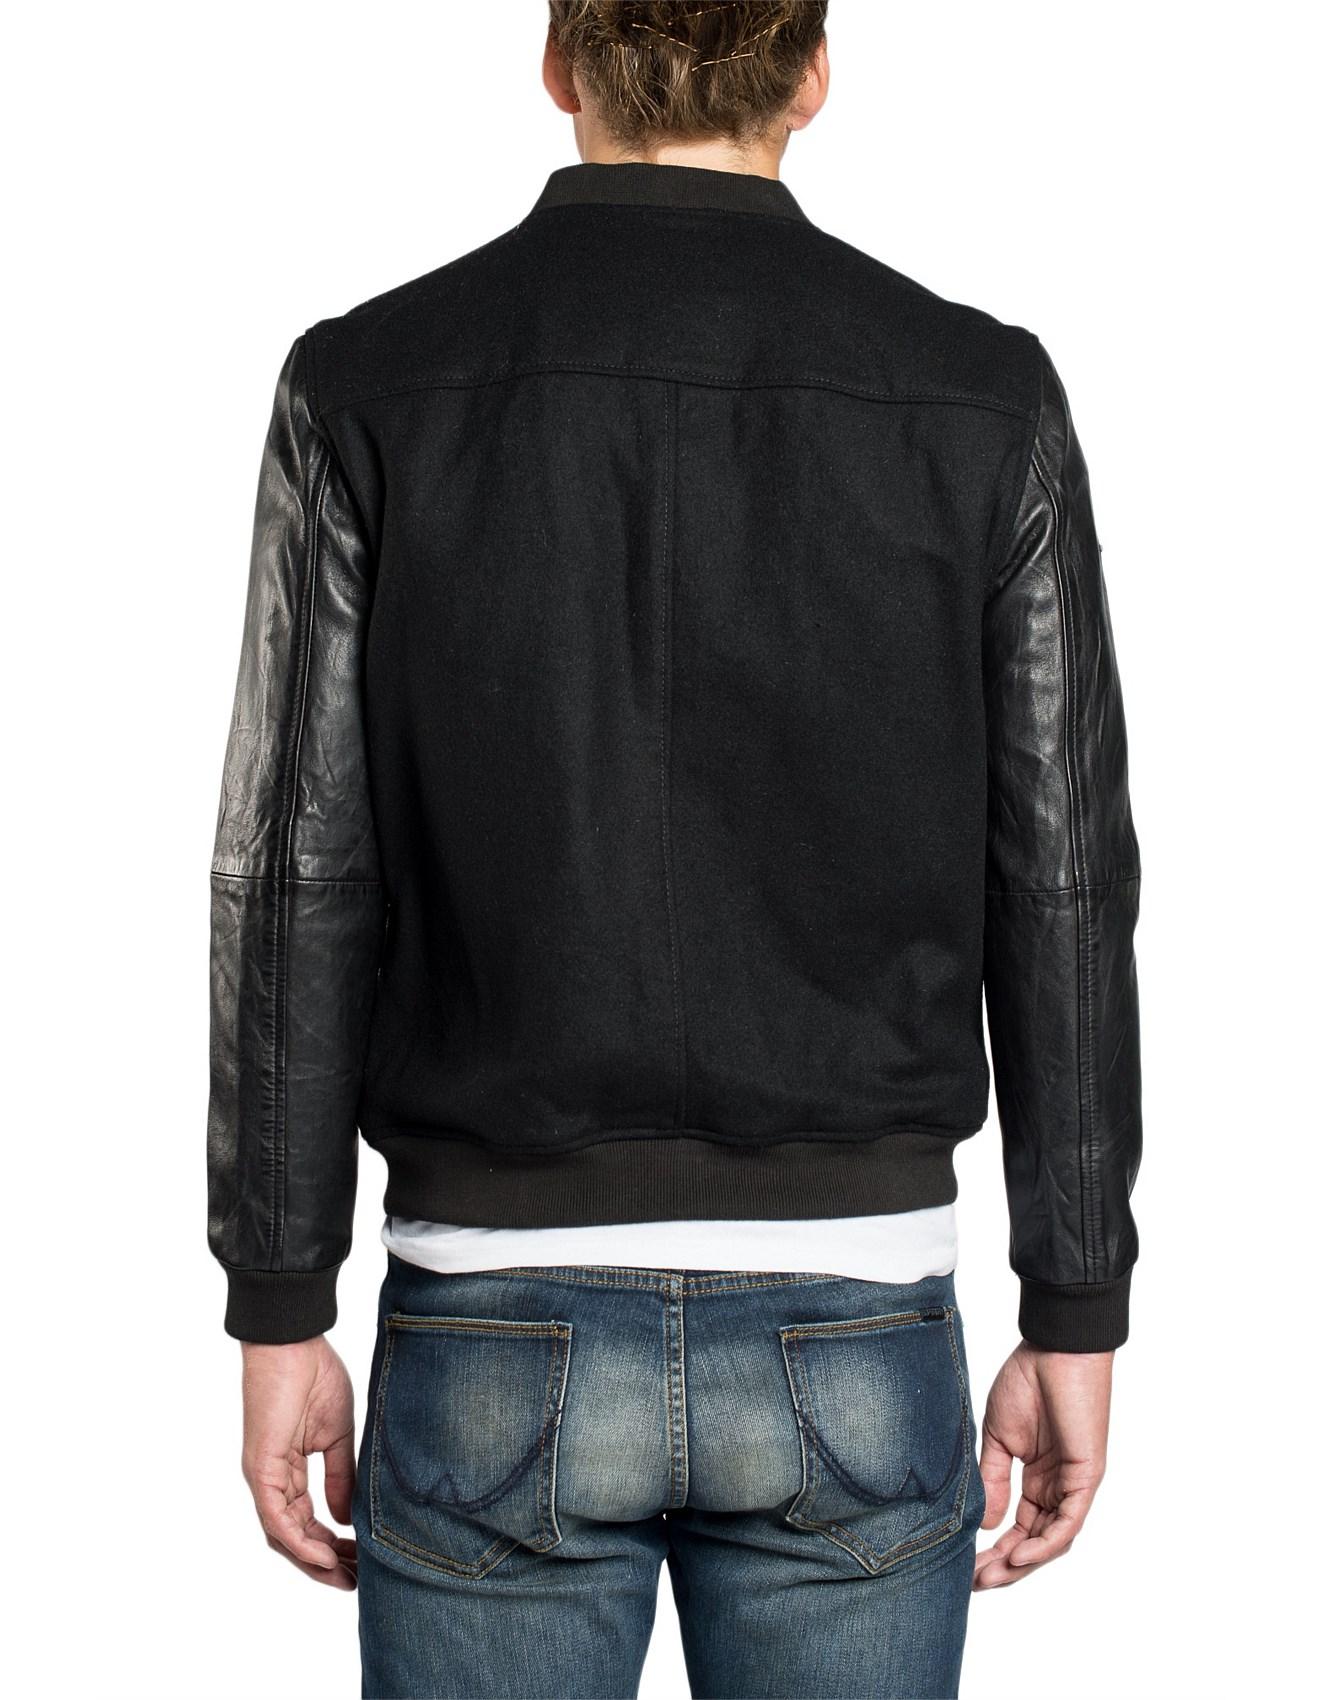 88d6c9c0f Varsity Wool Leather Bomber